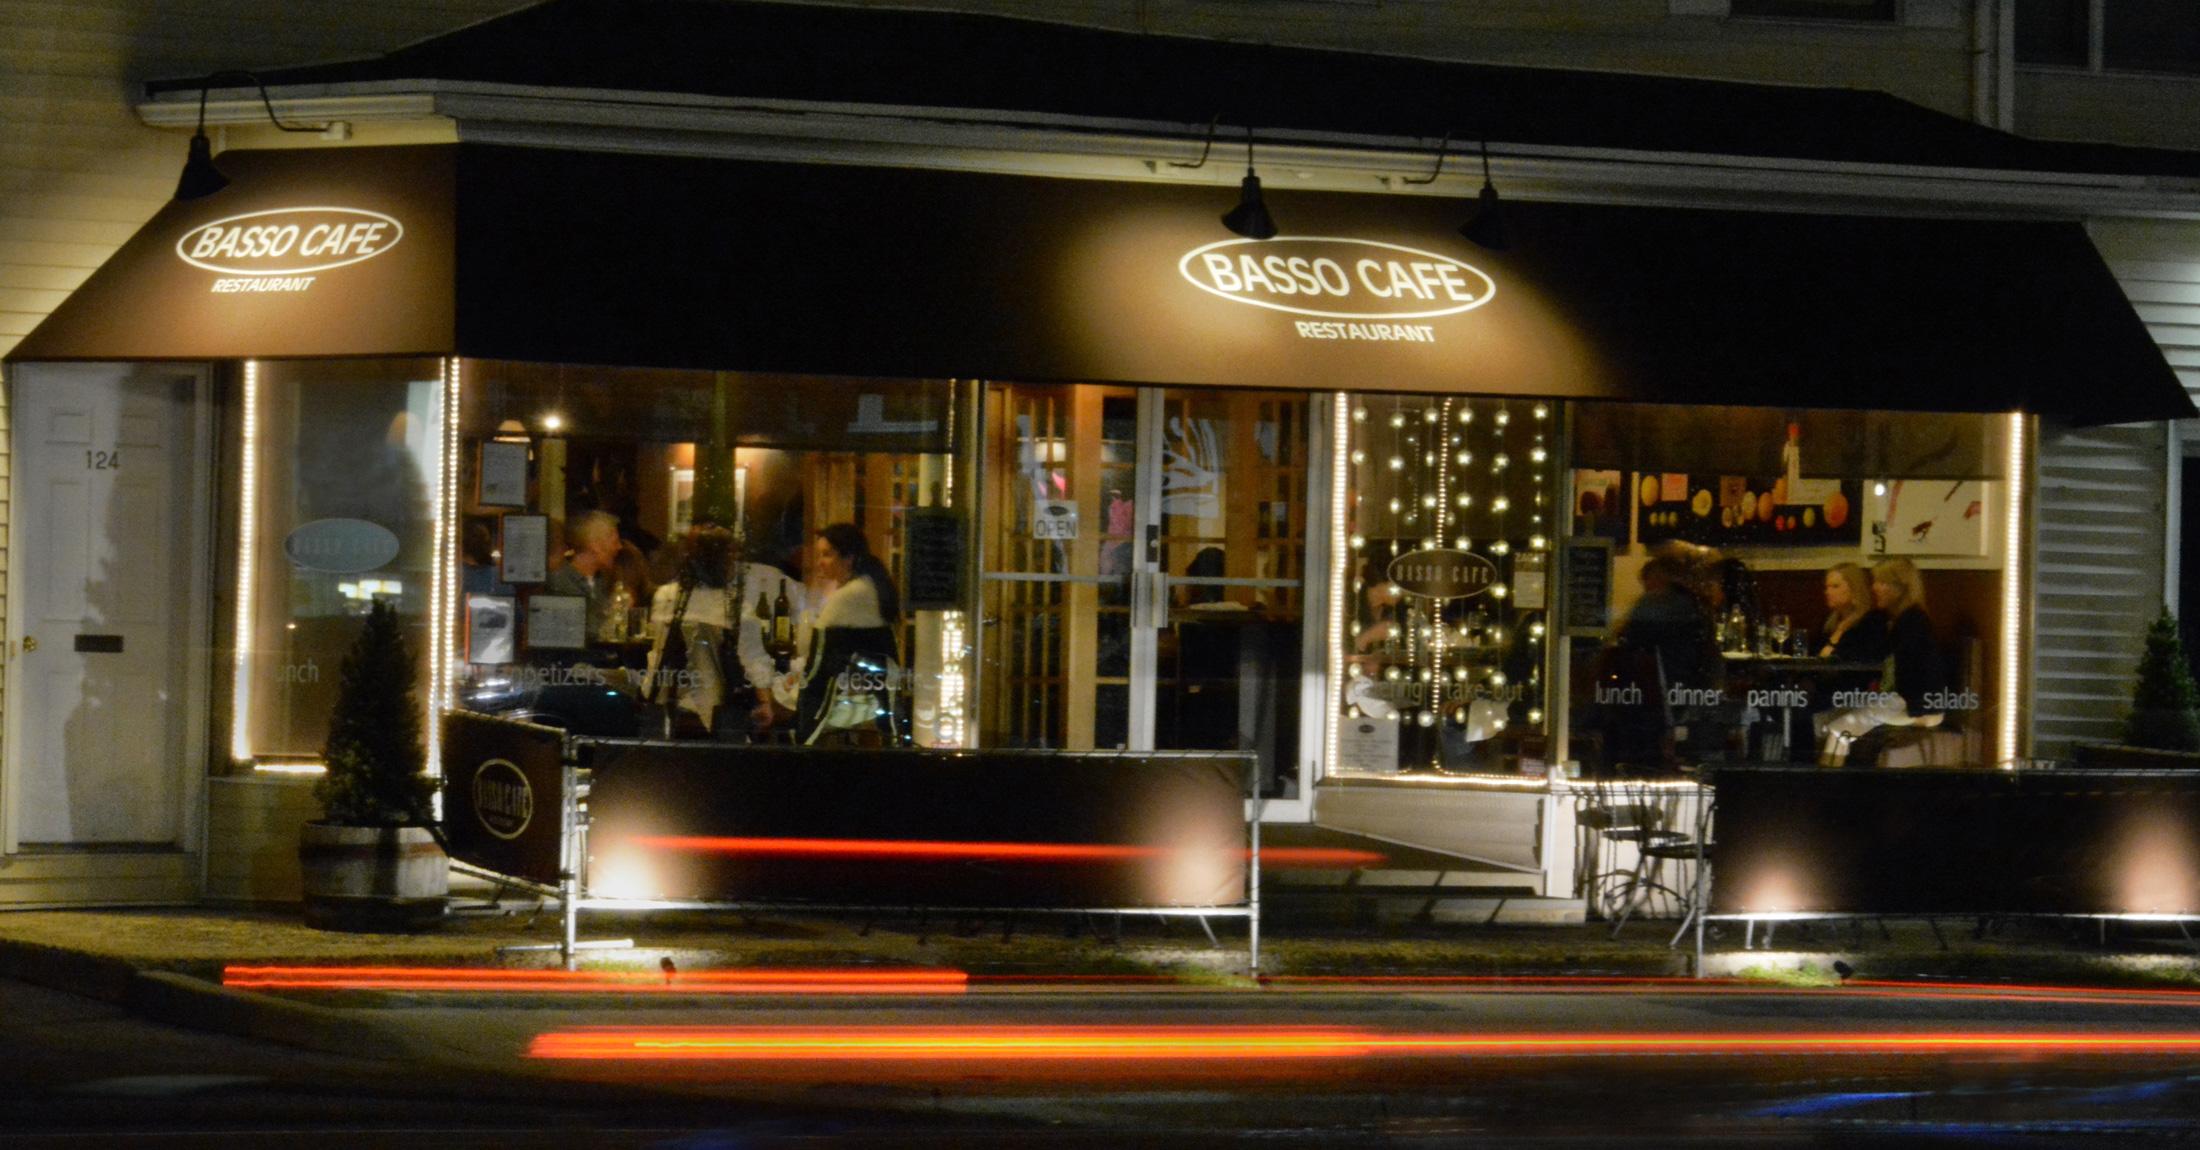 Basso Cafe Restaurant Norwalk Ct